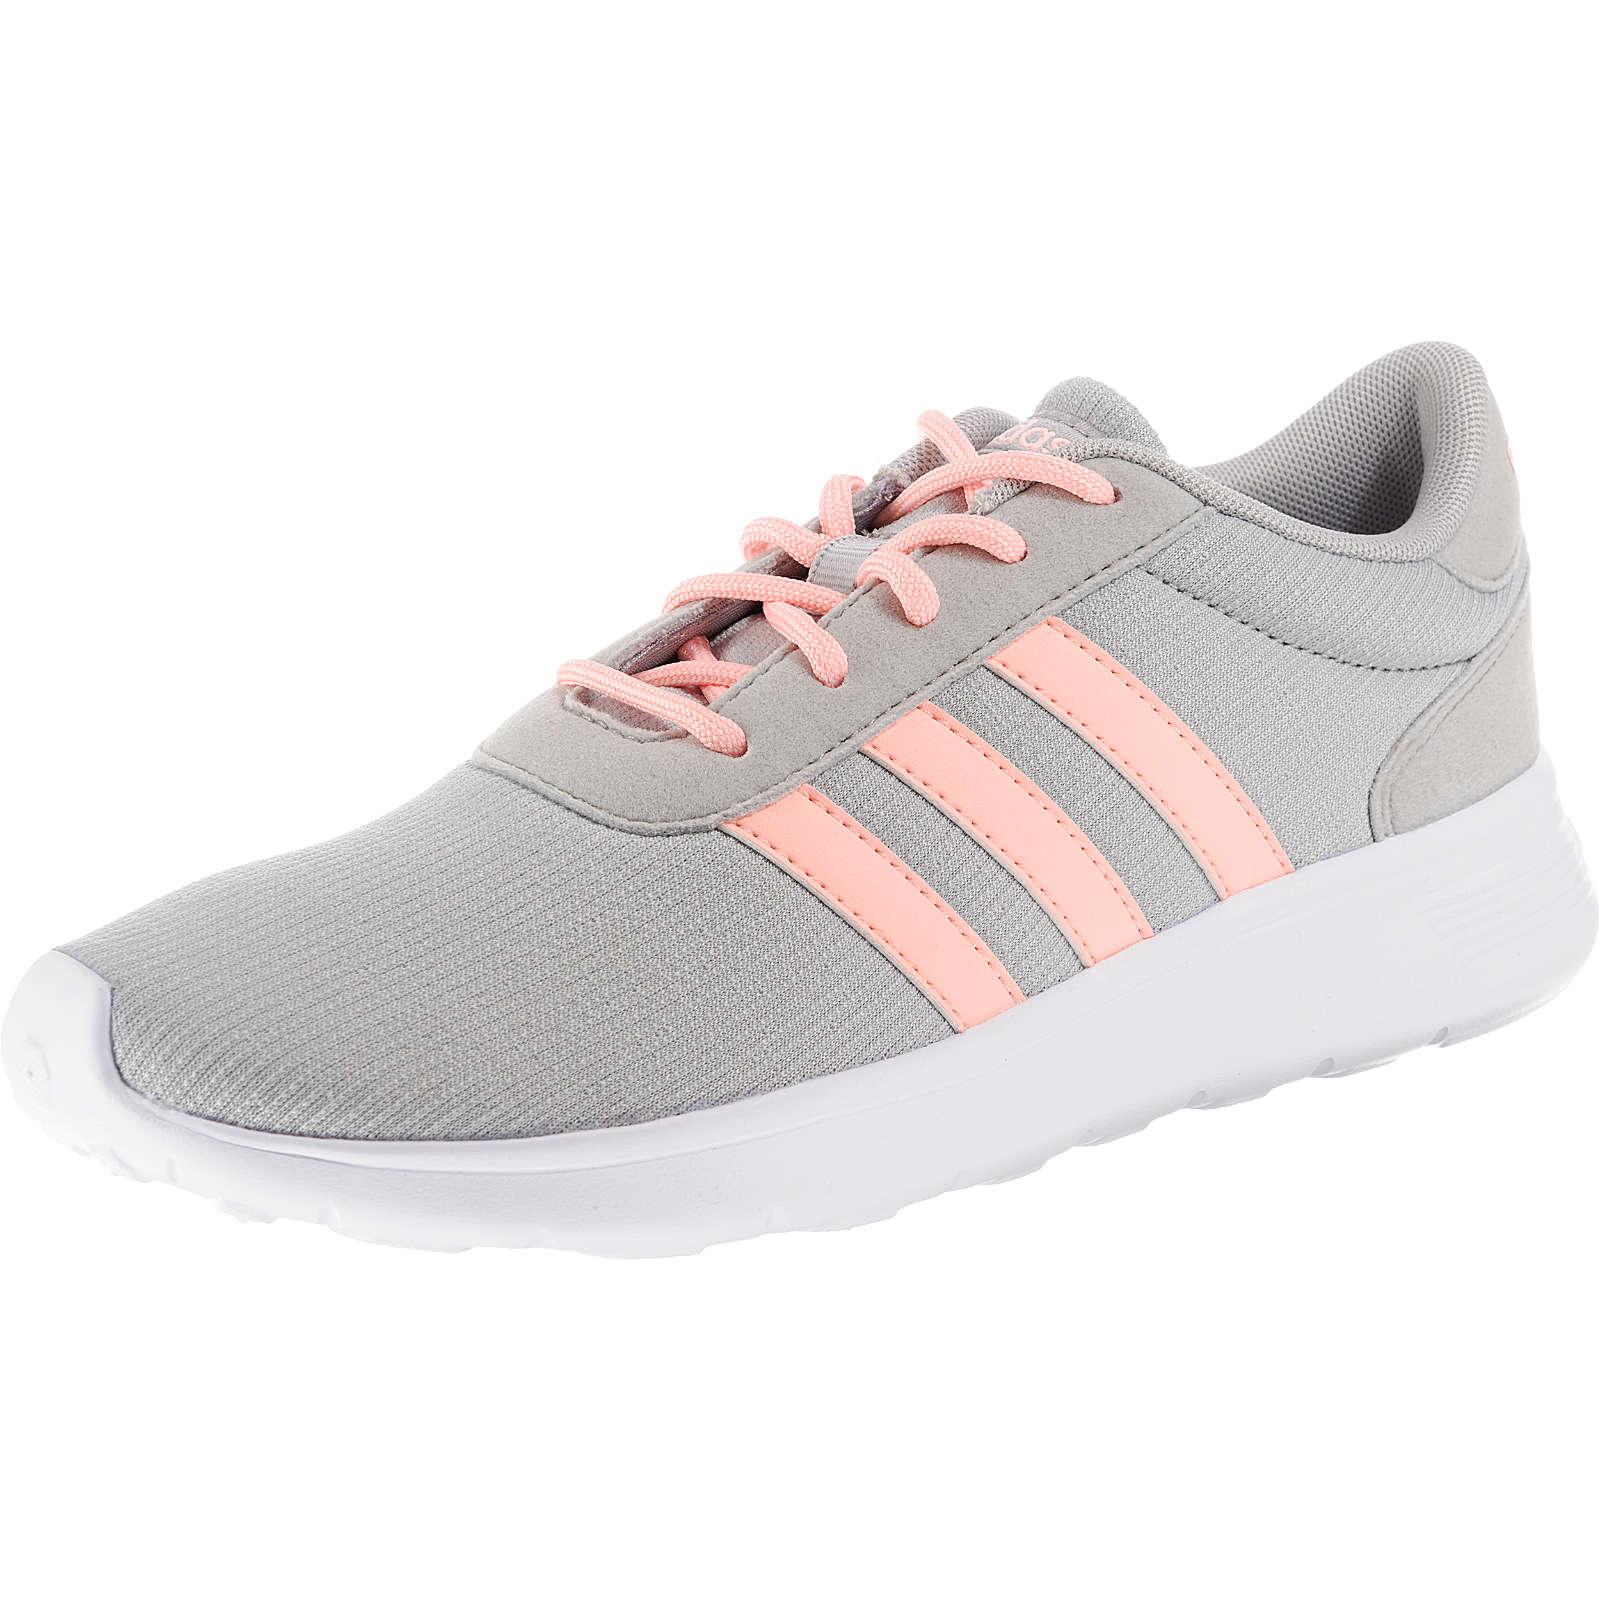 adidas Sport Inspired Lite Racer Sneakers Low grau Damen Gr. 39 1/3